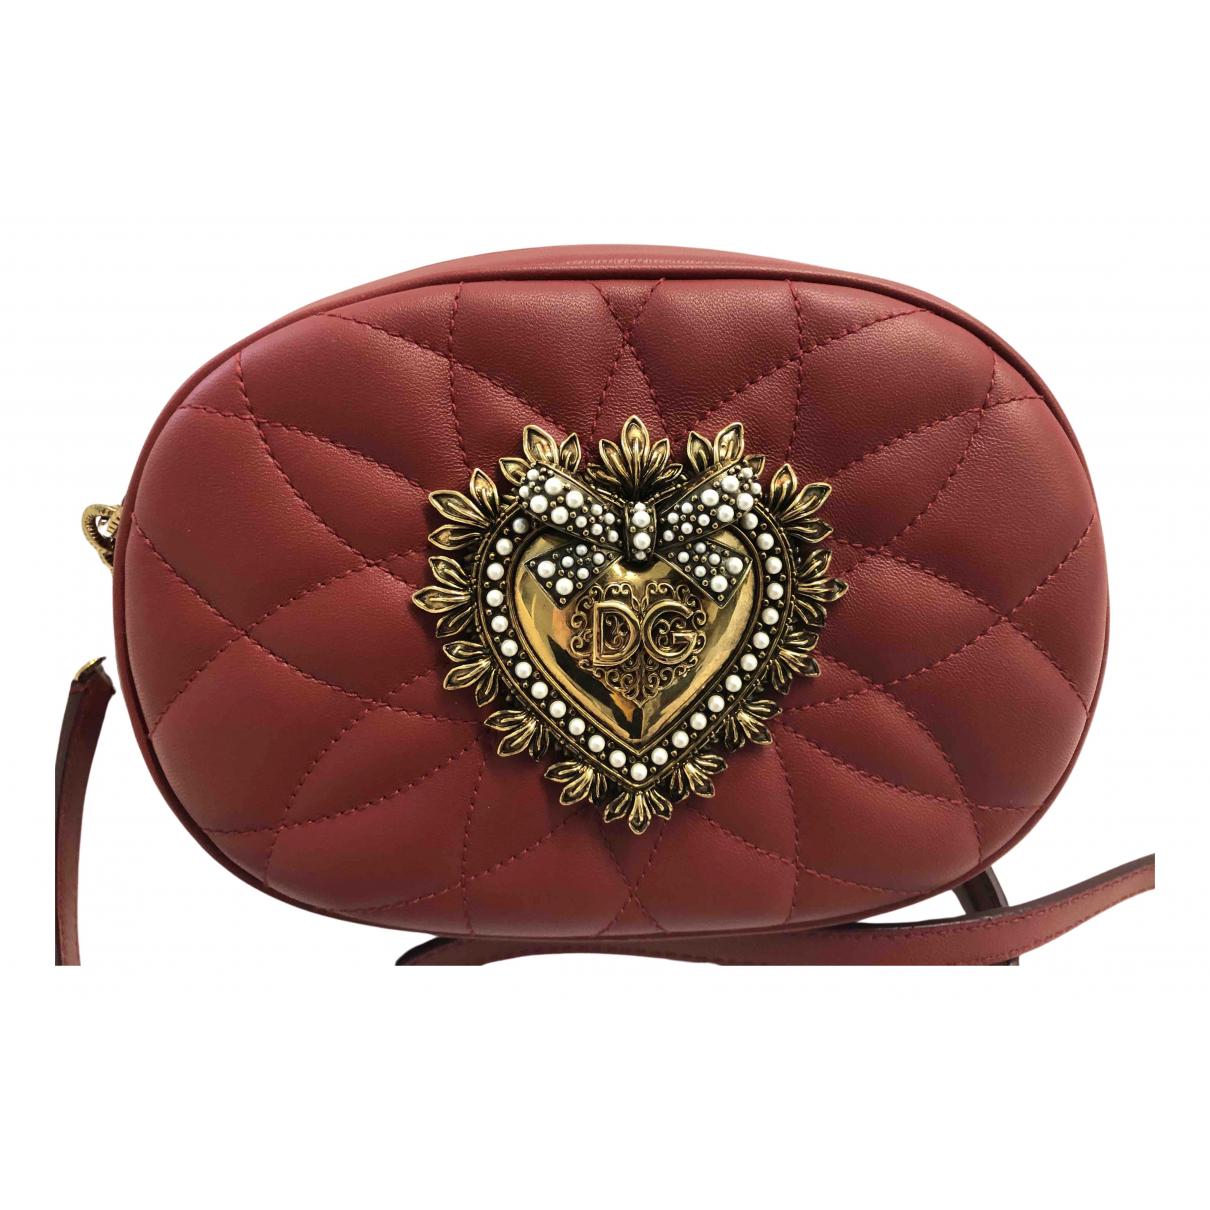 Dolce & Gabbana Devotion Handtasche in  Bordeauxrot Leder